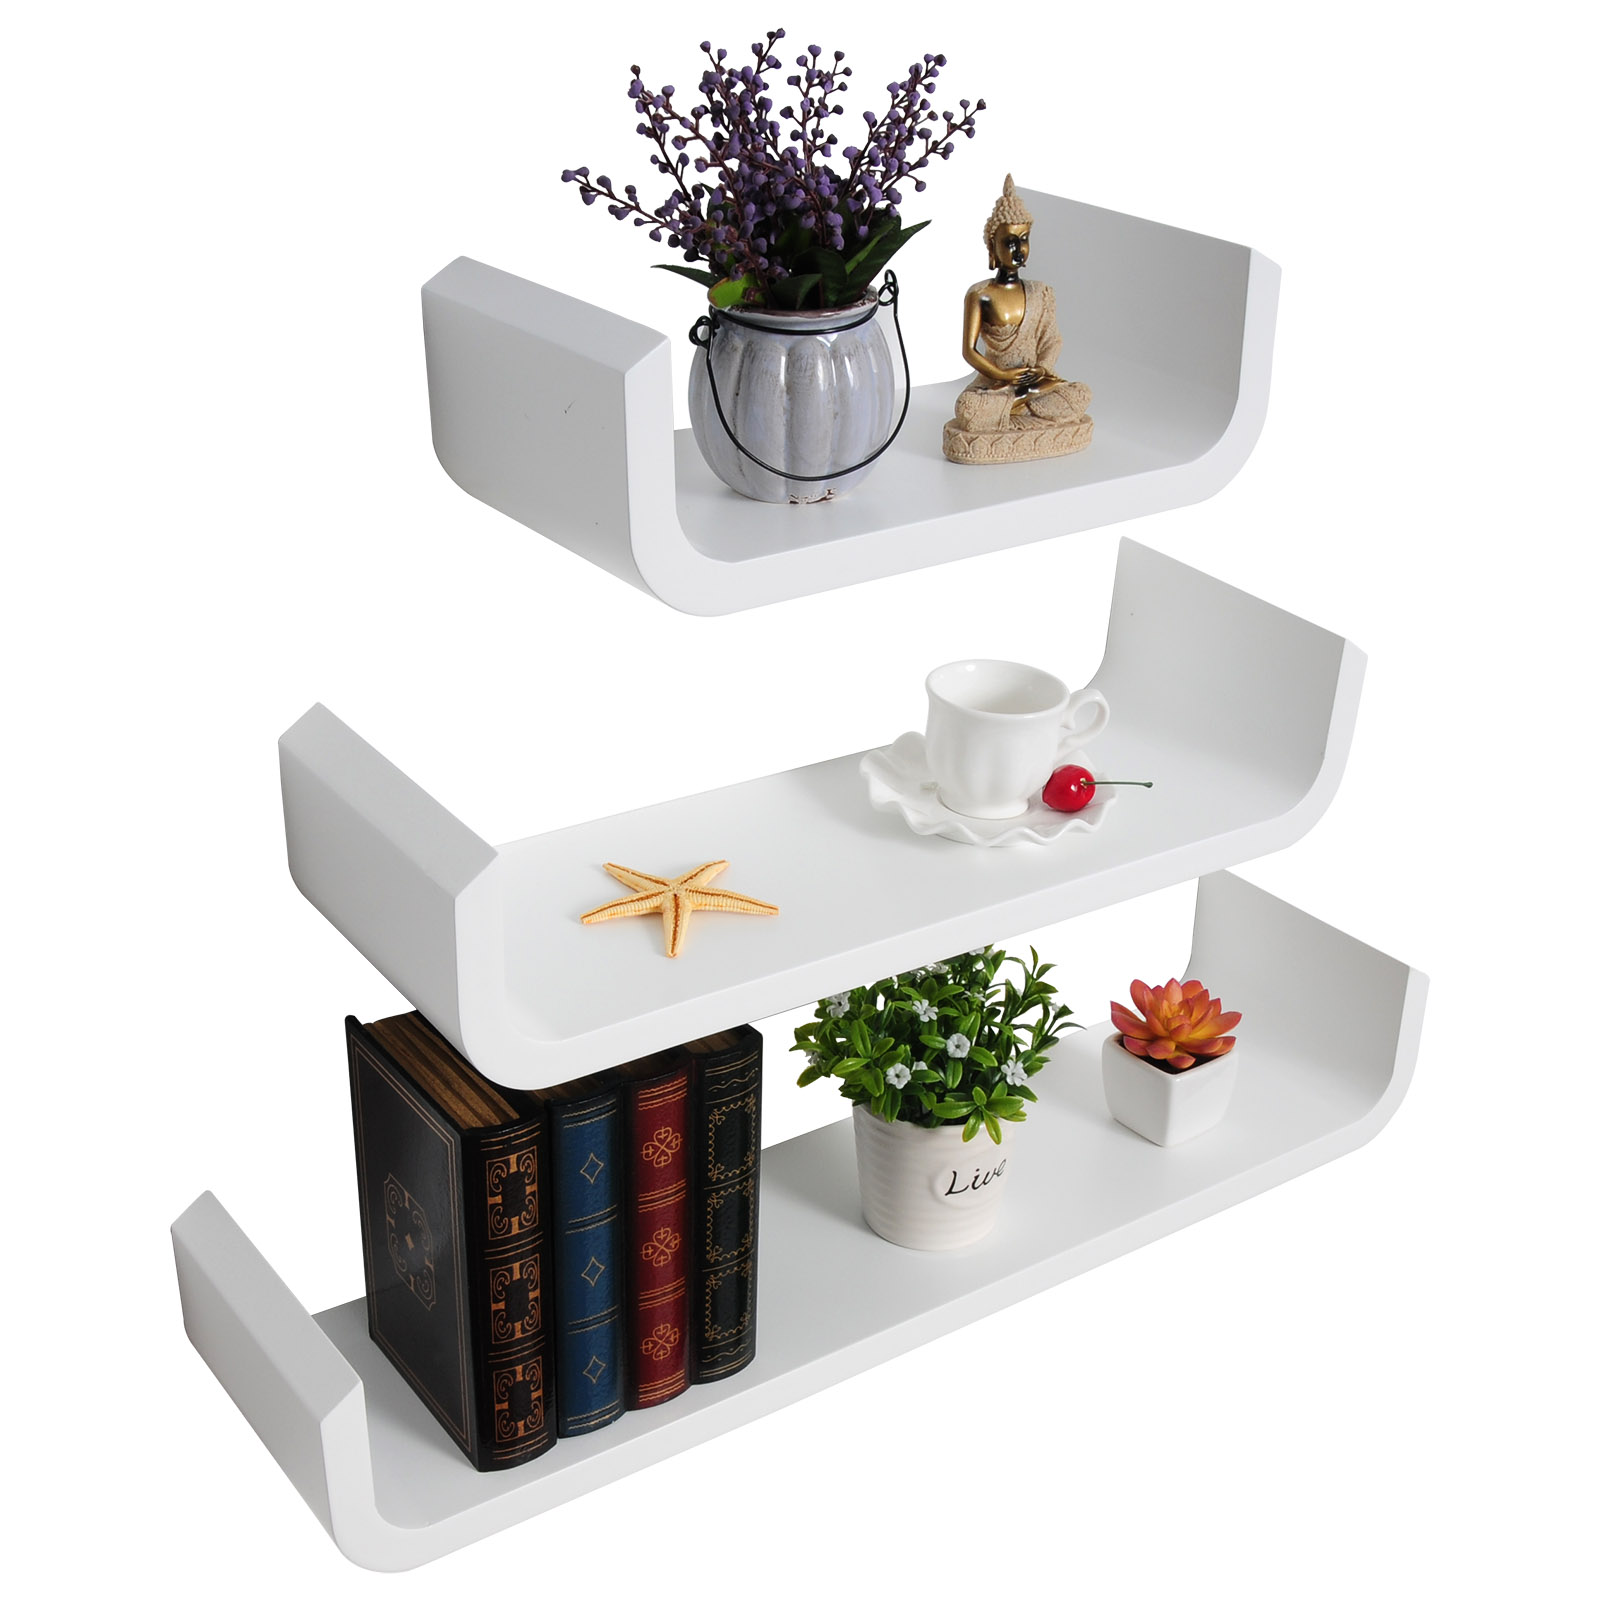 Floating-Wall-Shelves-Set-of-3-Board-Wall-Mount-Shelf-Storage-amp-Decorative-u117